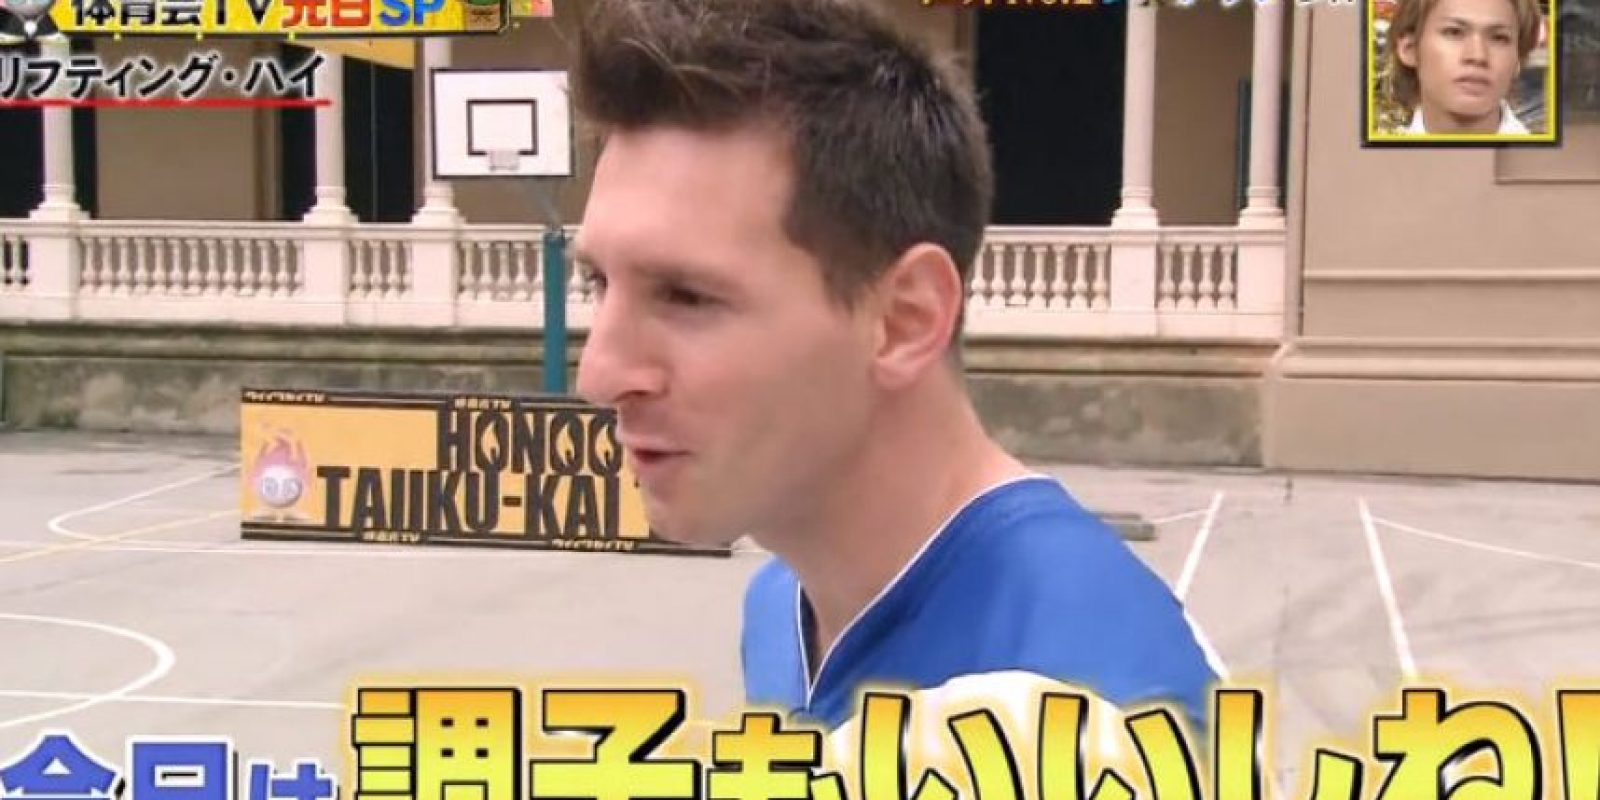 El argentino demostró su gran técnica individual en un programa japonés Foto:Youtube